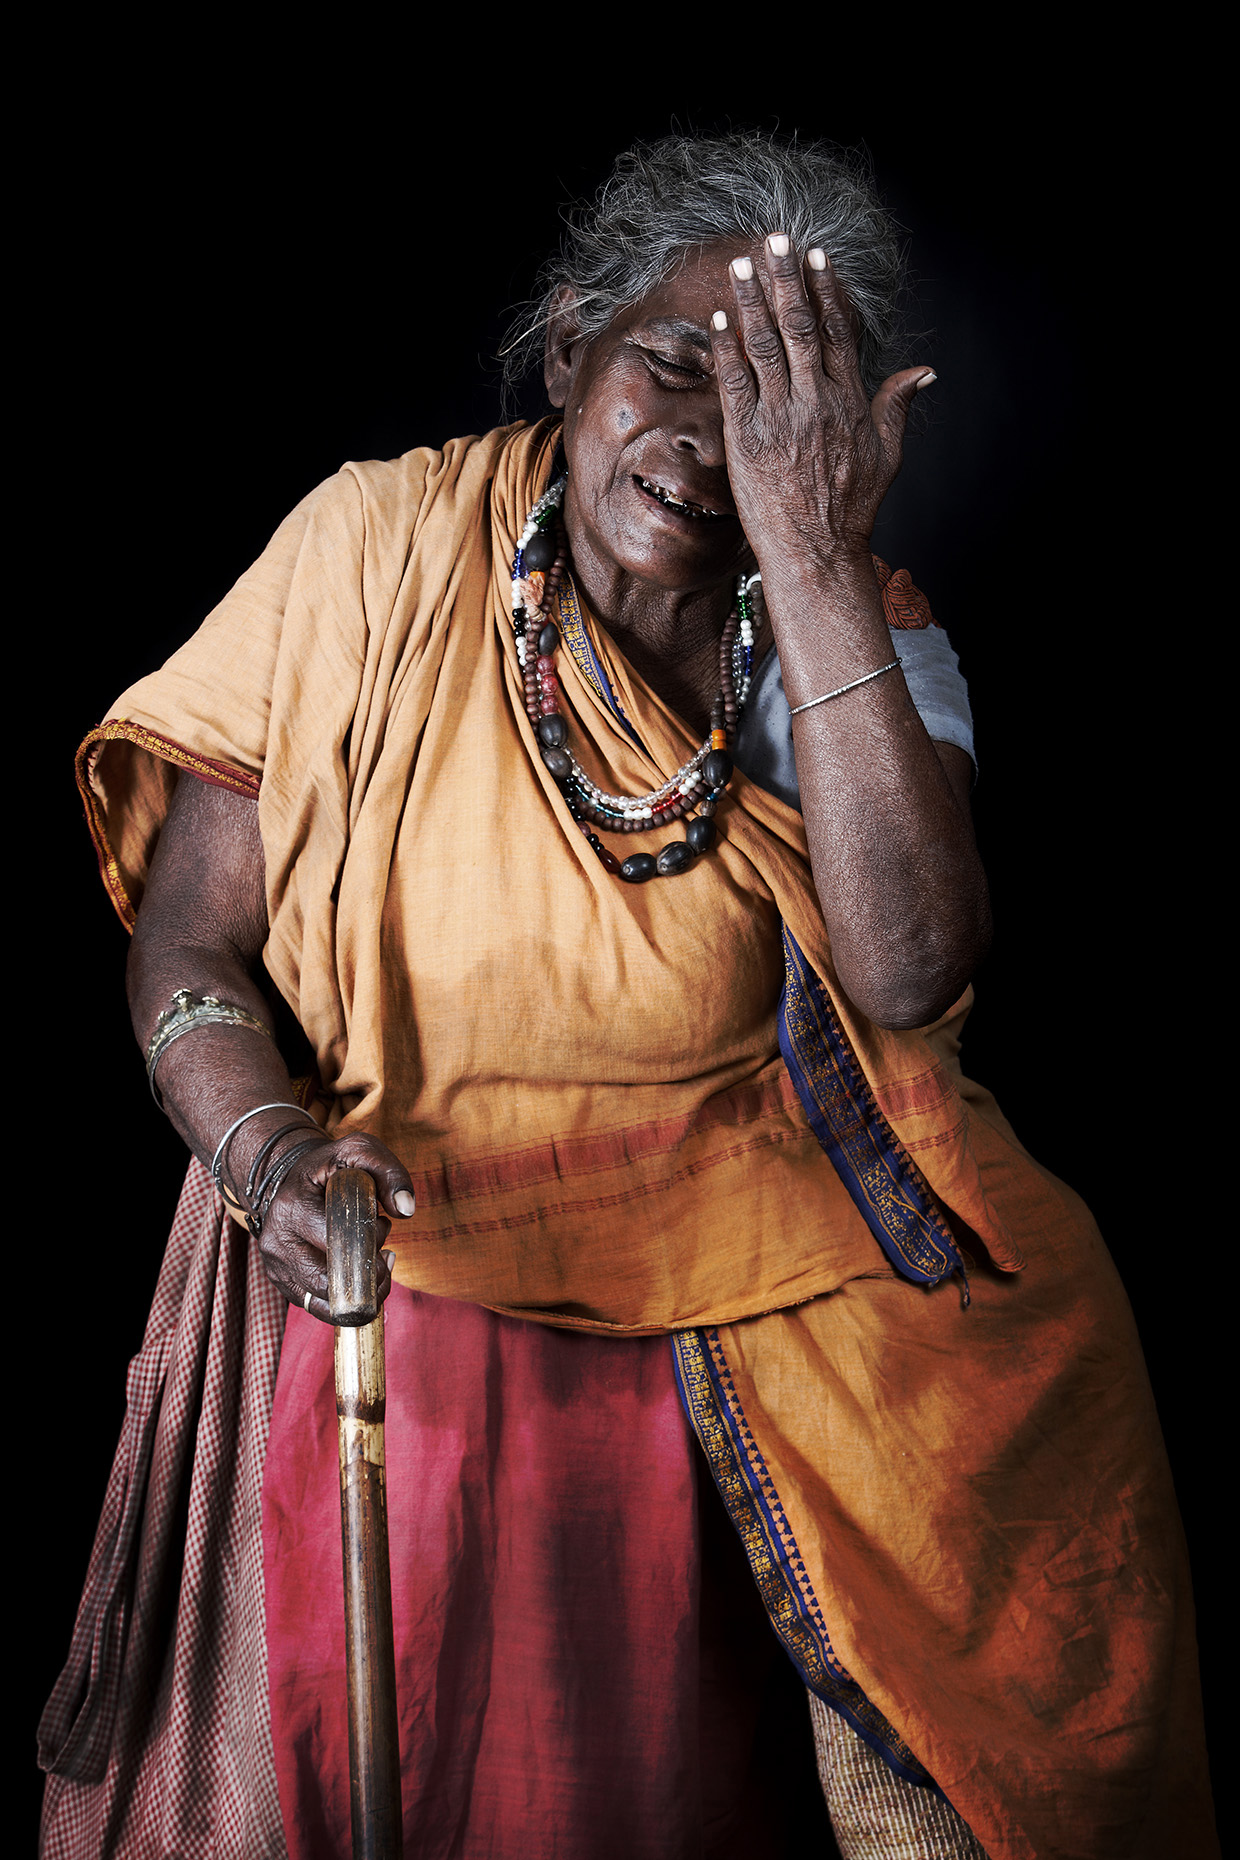 Beggar at the Kumbh Mela